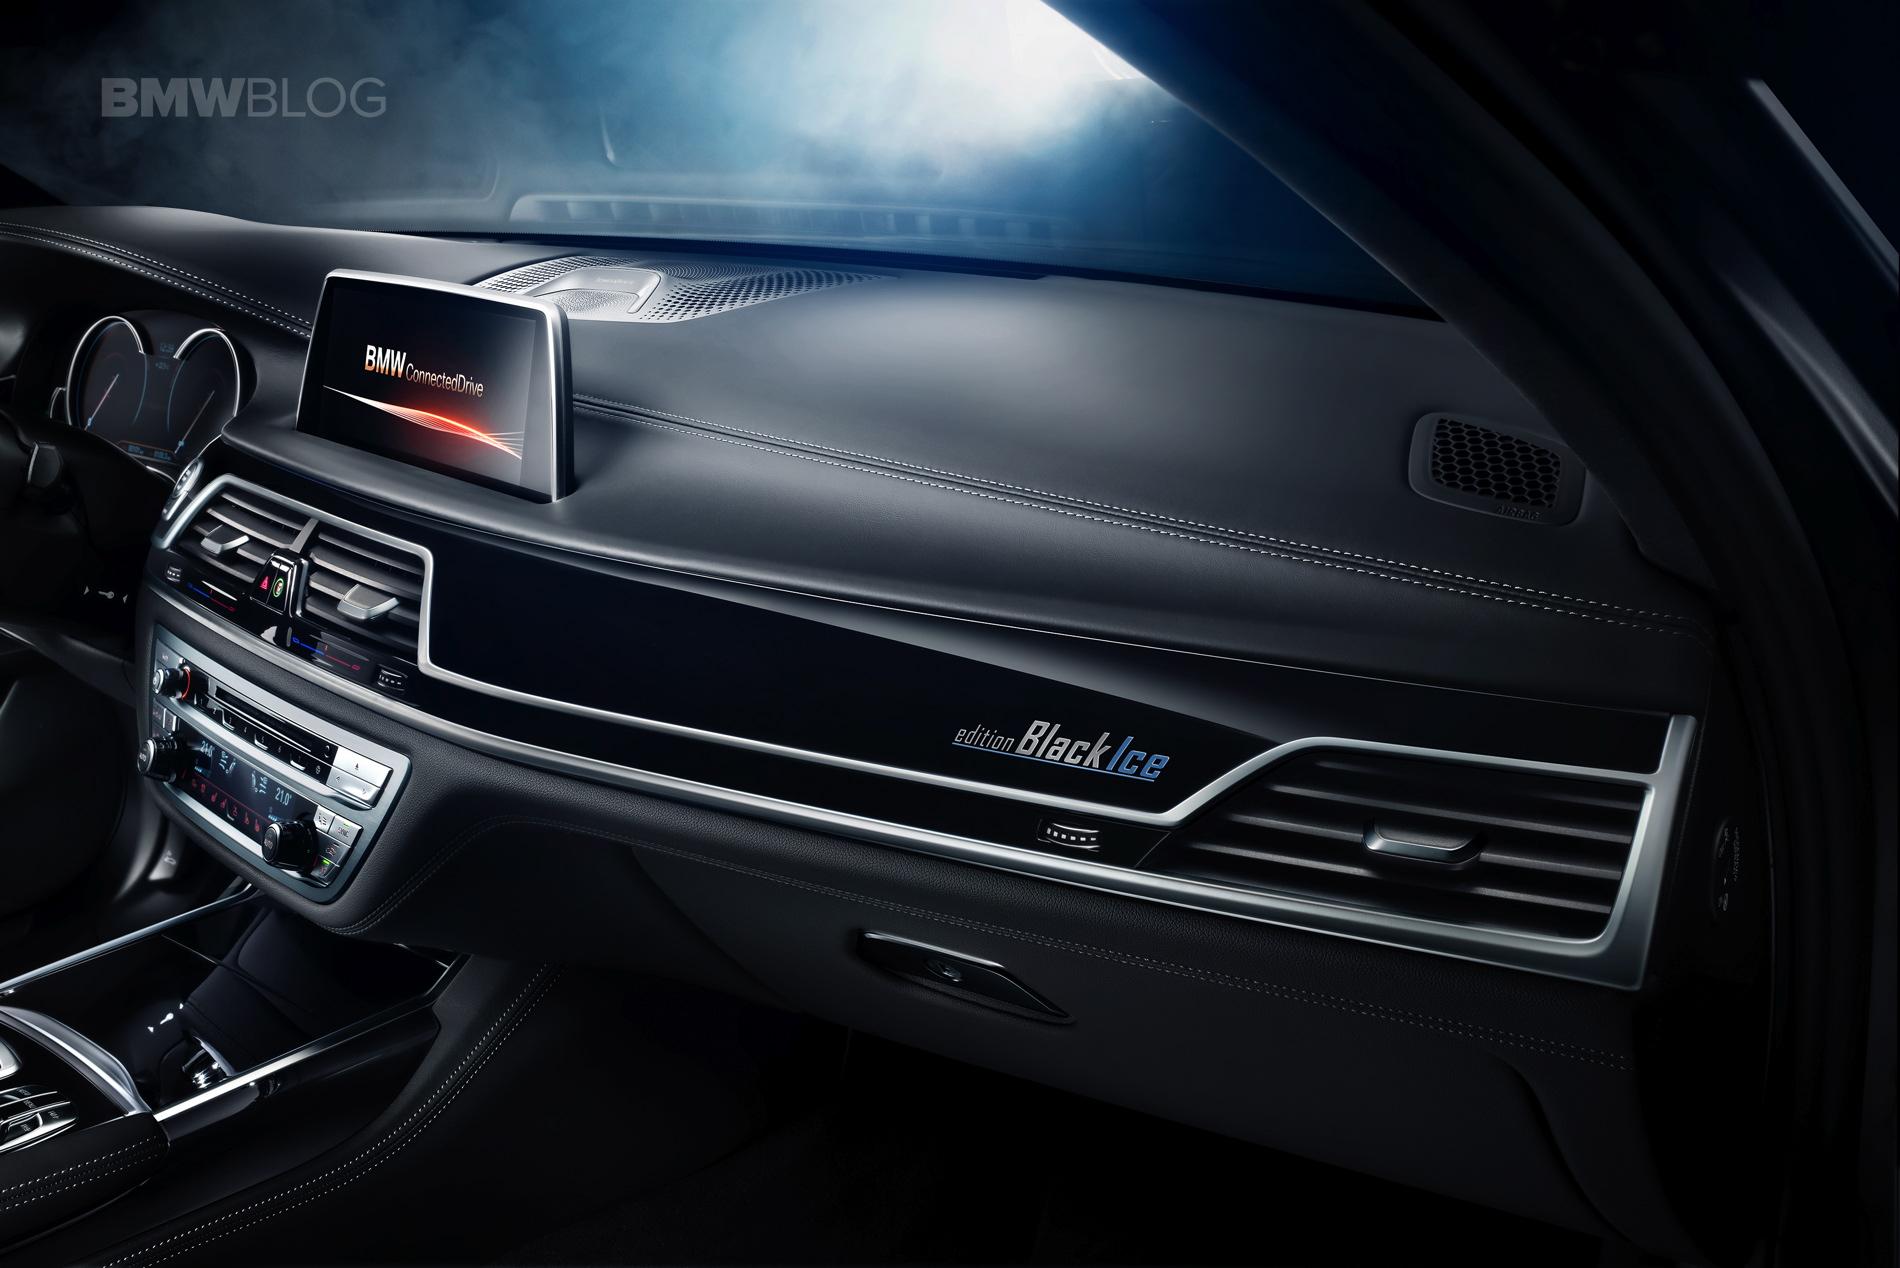 BMW Série 7 Black Ice Edition - Intérieur